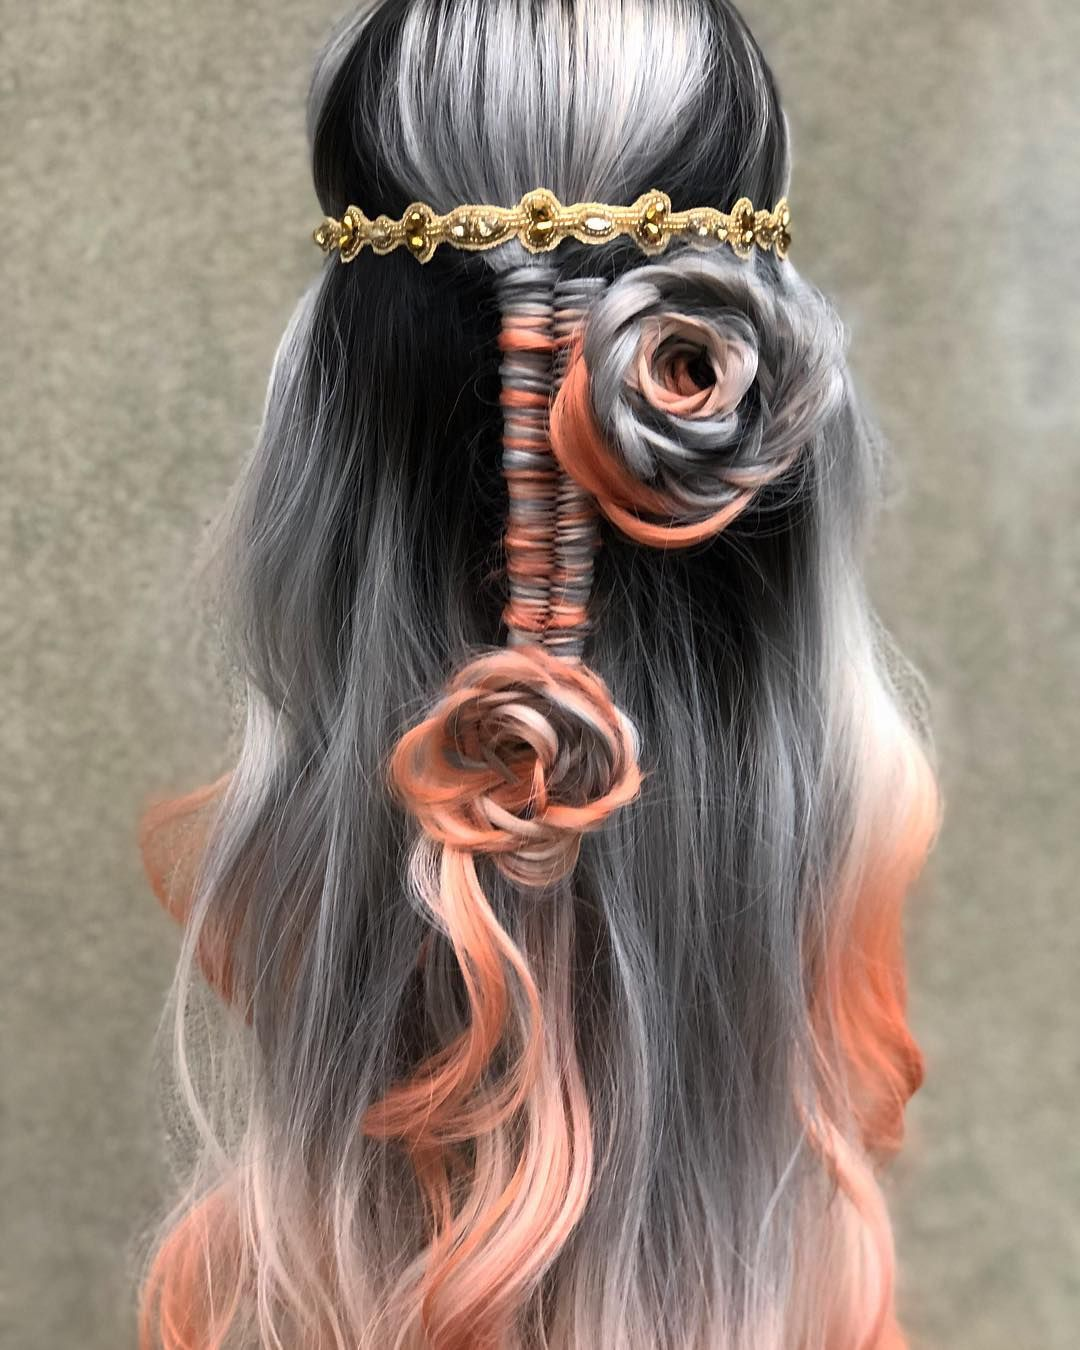 XXL Waves Hair Style  Hair styles, Rose braid, Rose hair